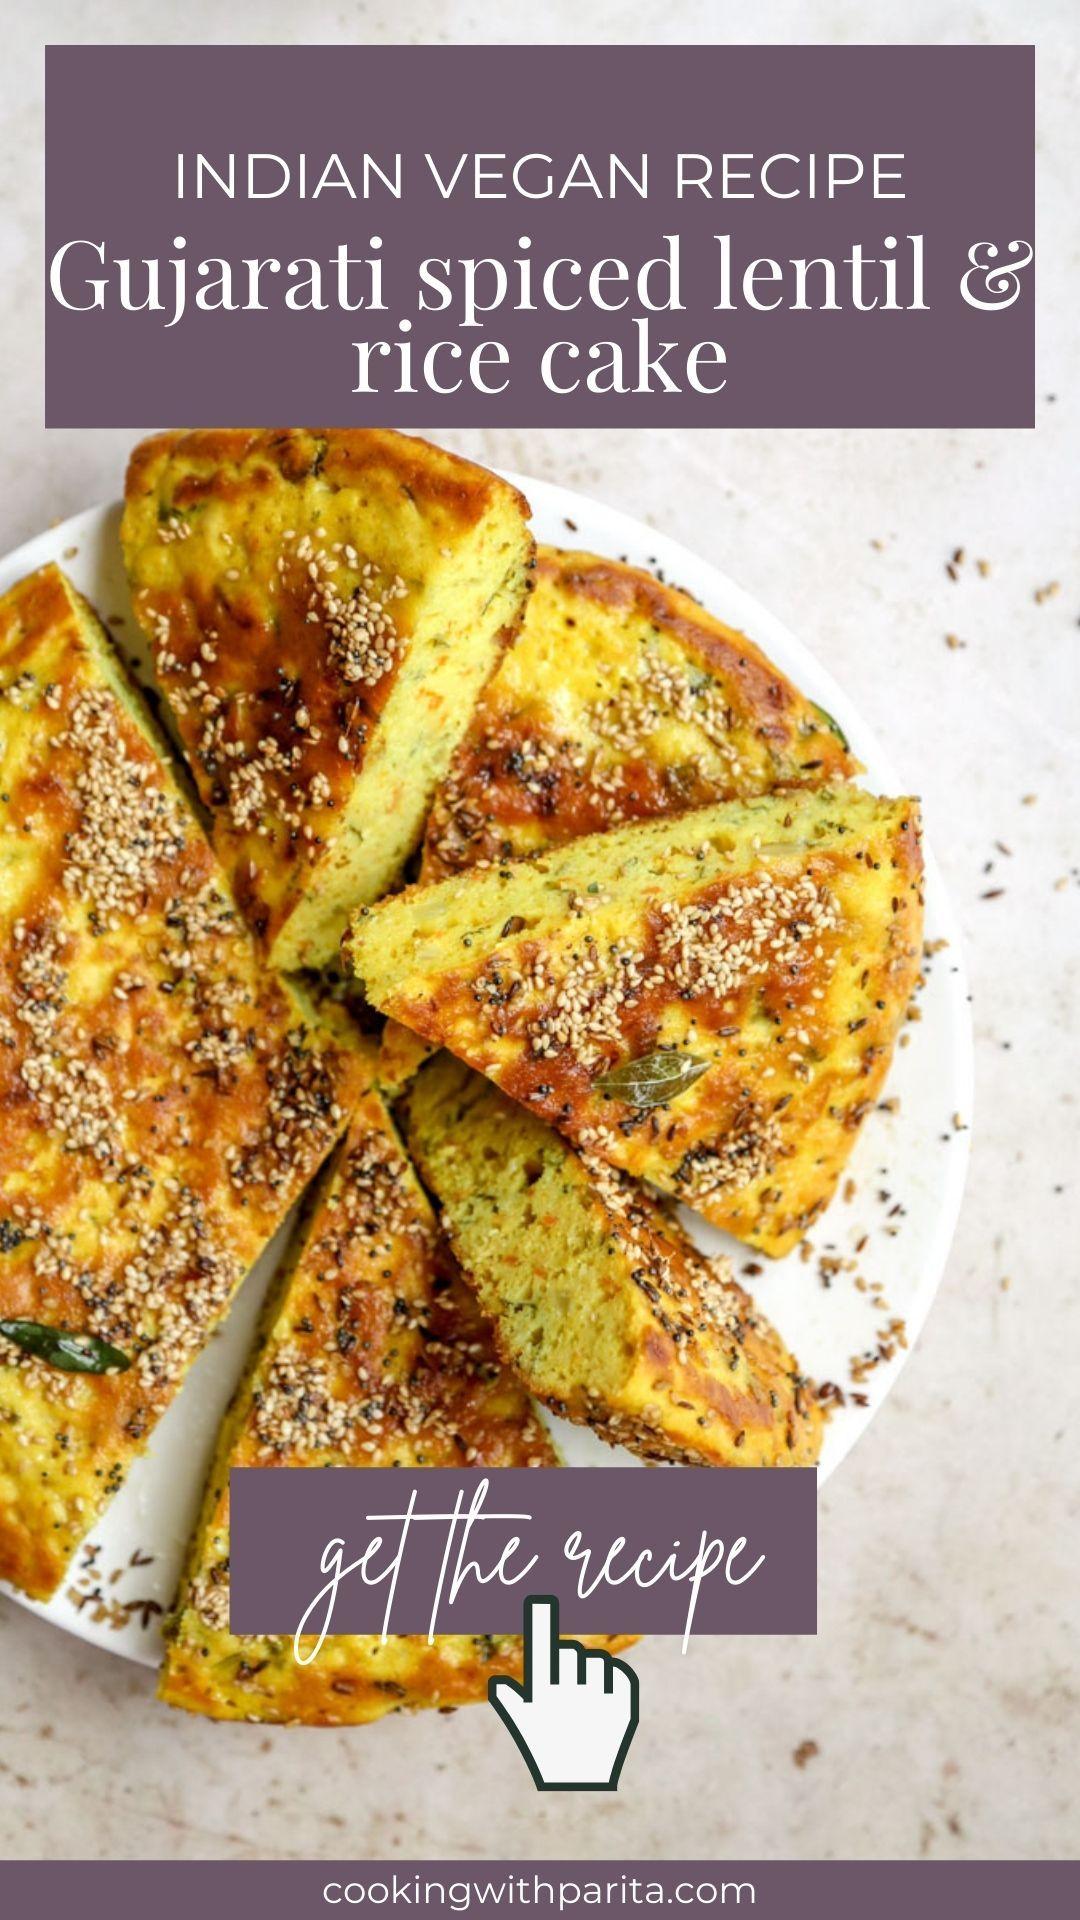 Handvo (Spicy Rice + Lentil Cake) - Indian Plant B